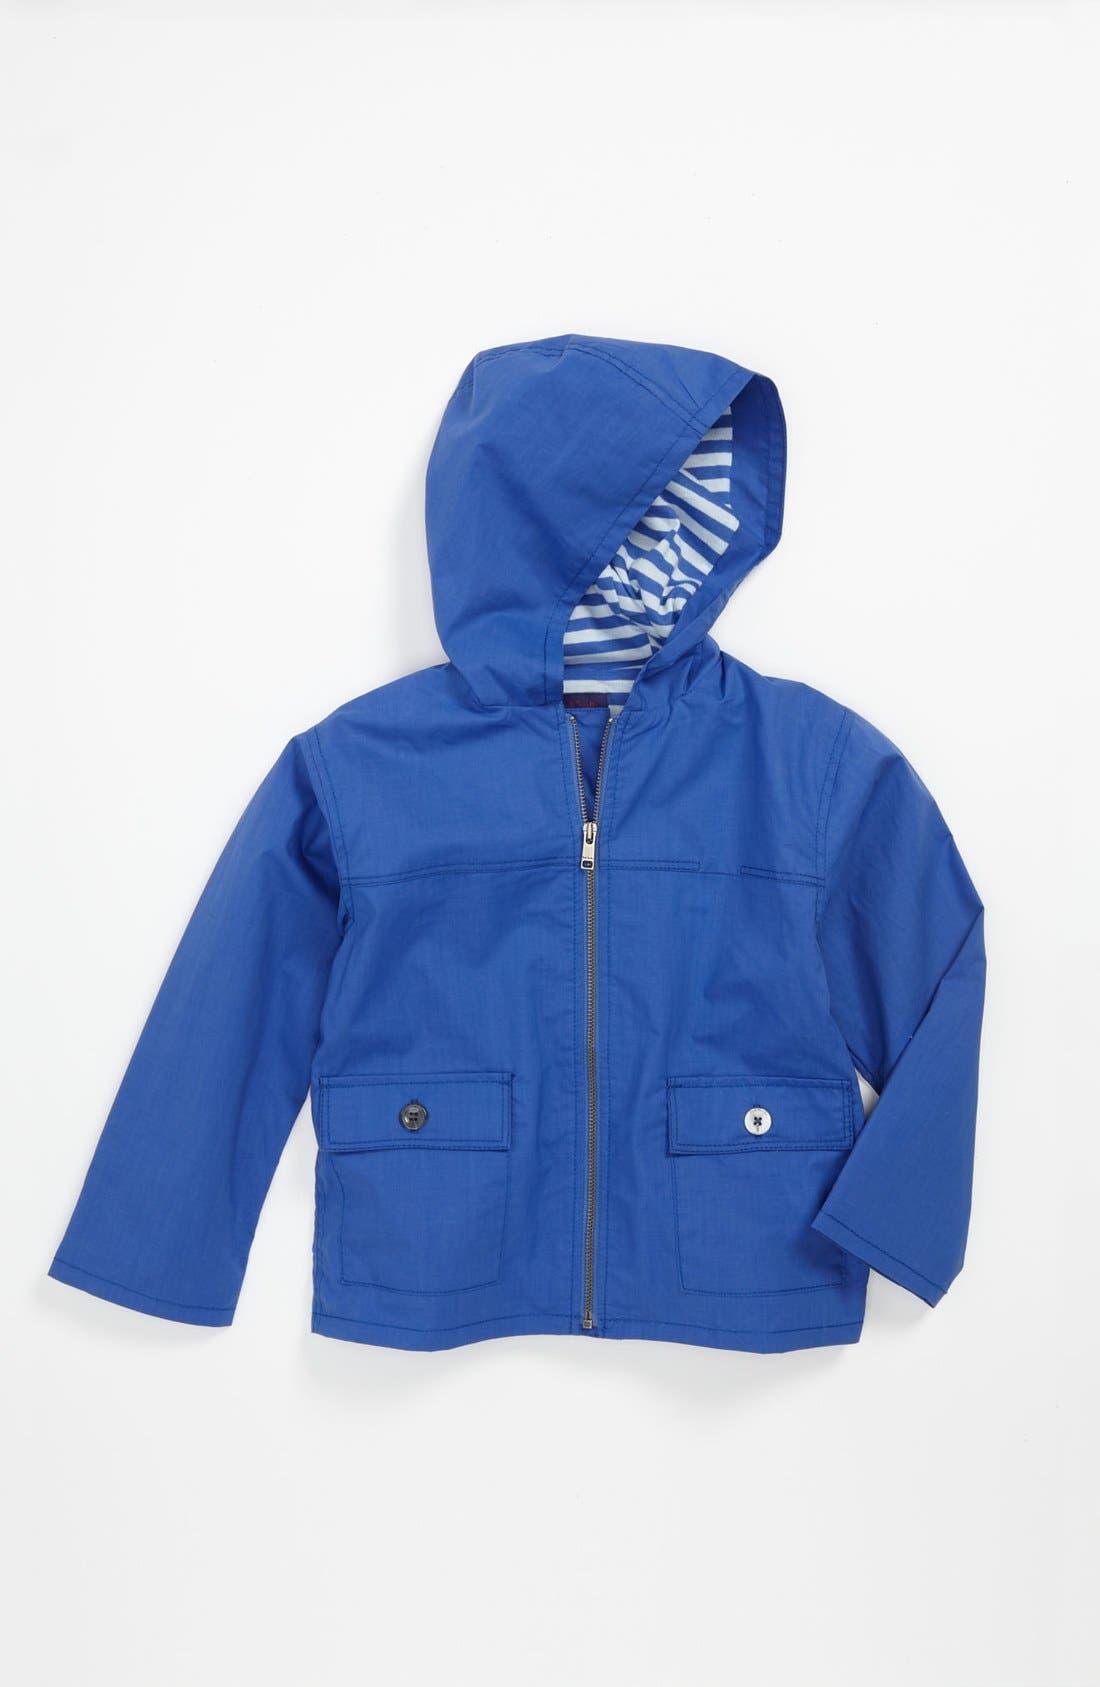 Alternate Image 1 Selected - Paul Smith Junior Jacket (Baby)